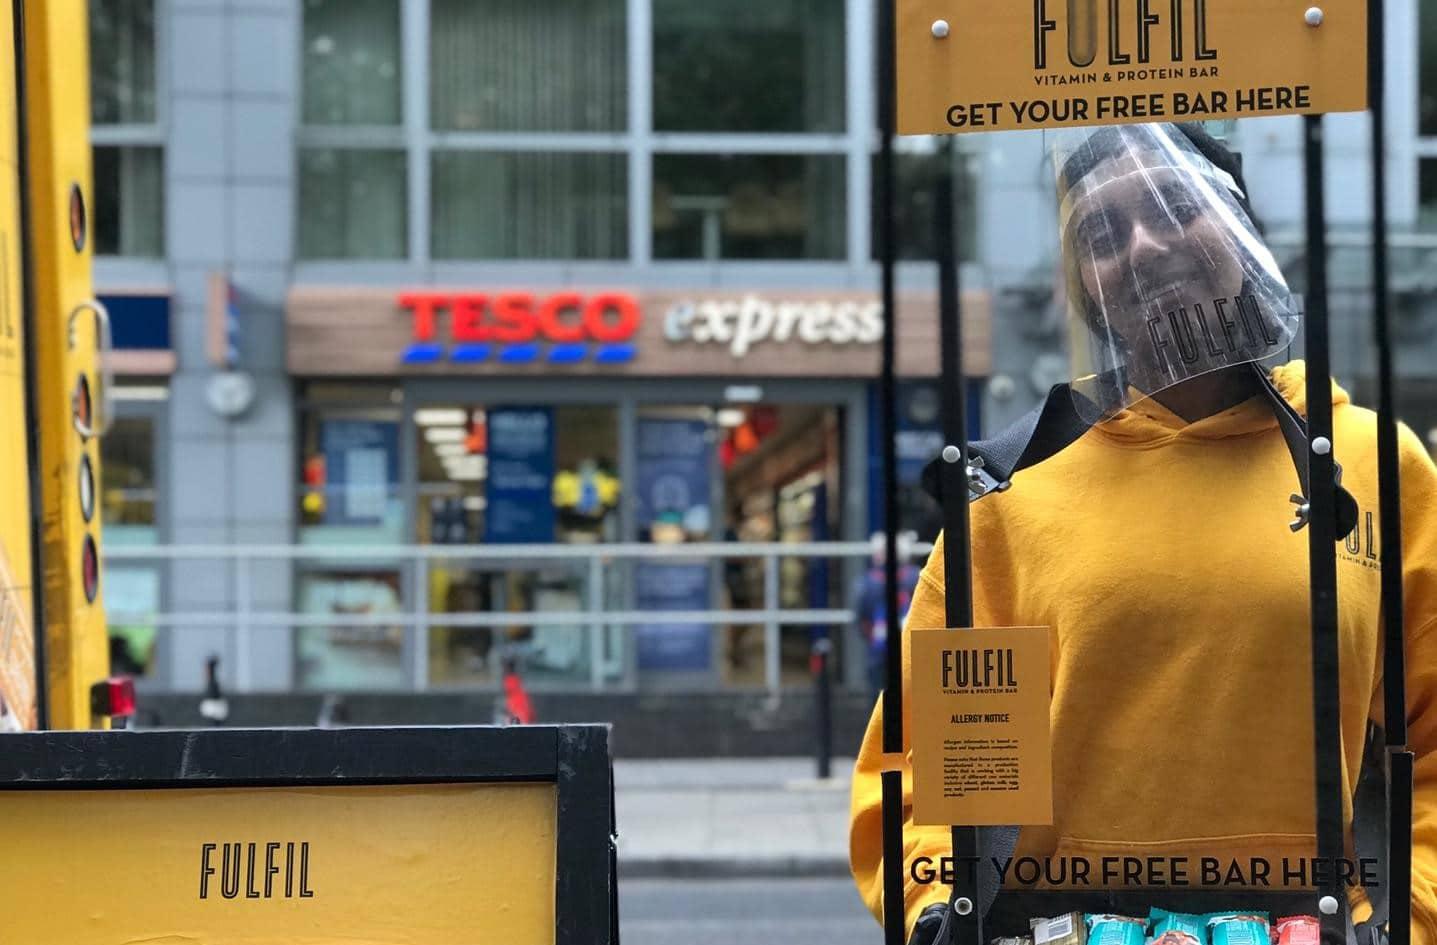 Fulfil - Safe Sampling Sainsburys Tesco, M&S, Co-op Suburban High Streets & Parks